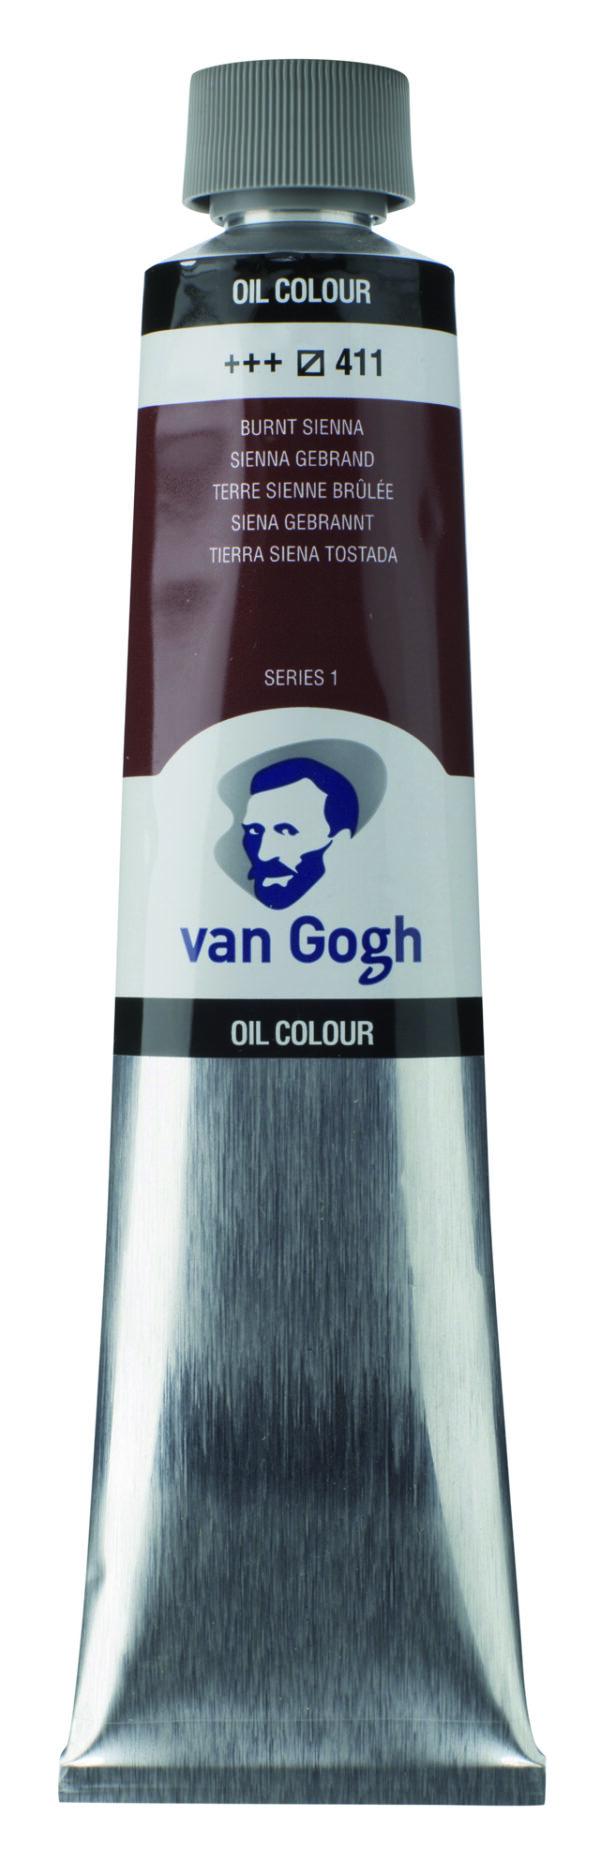 Van Gogh 411 Burnt sienna - 200 ml